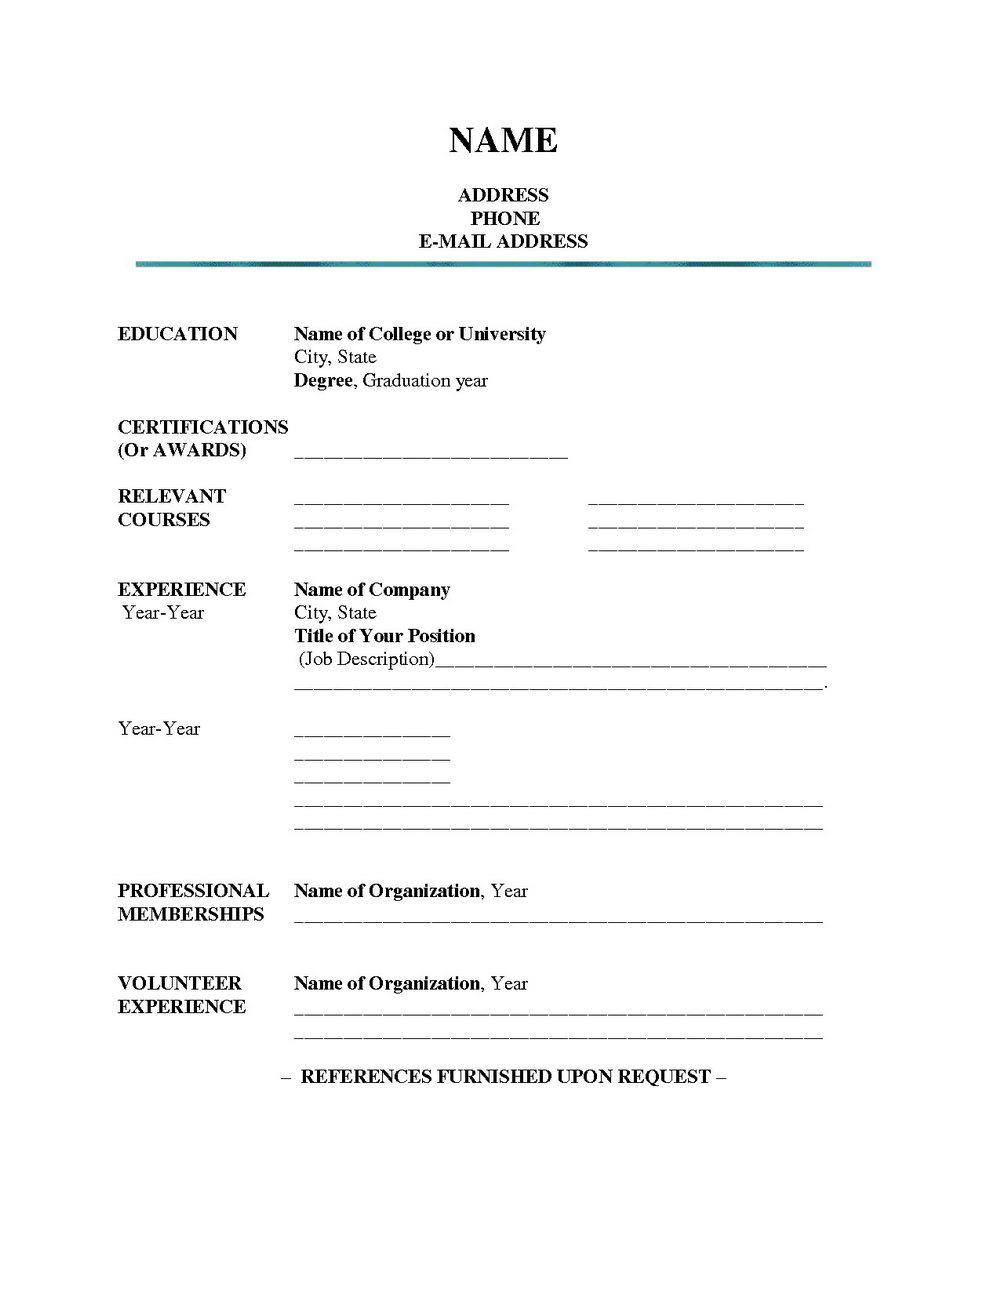 Free Blank Resume Form Printable | Mbm Legal - Free Blank Resume Forms Printable